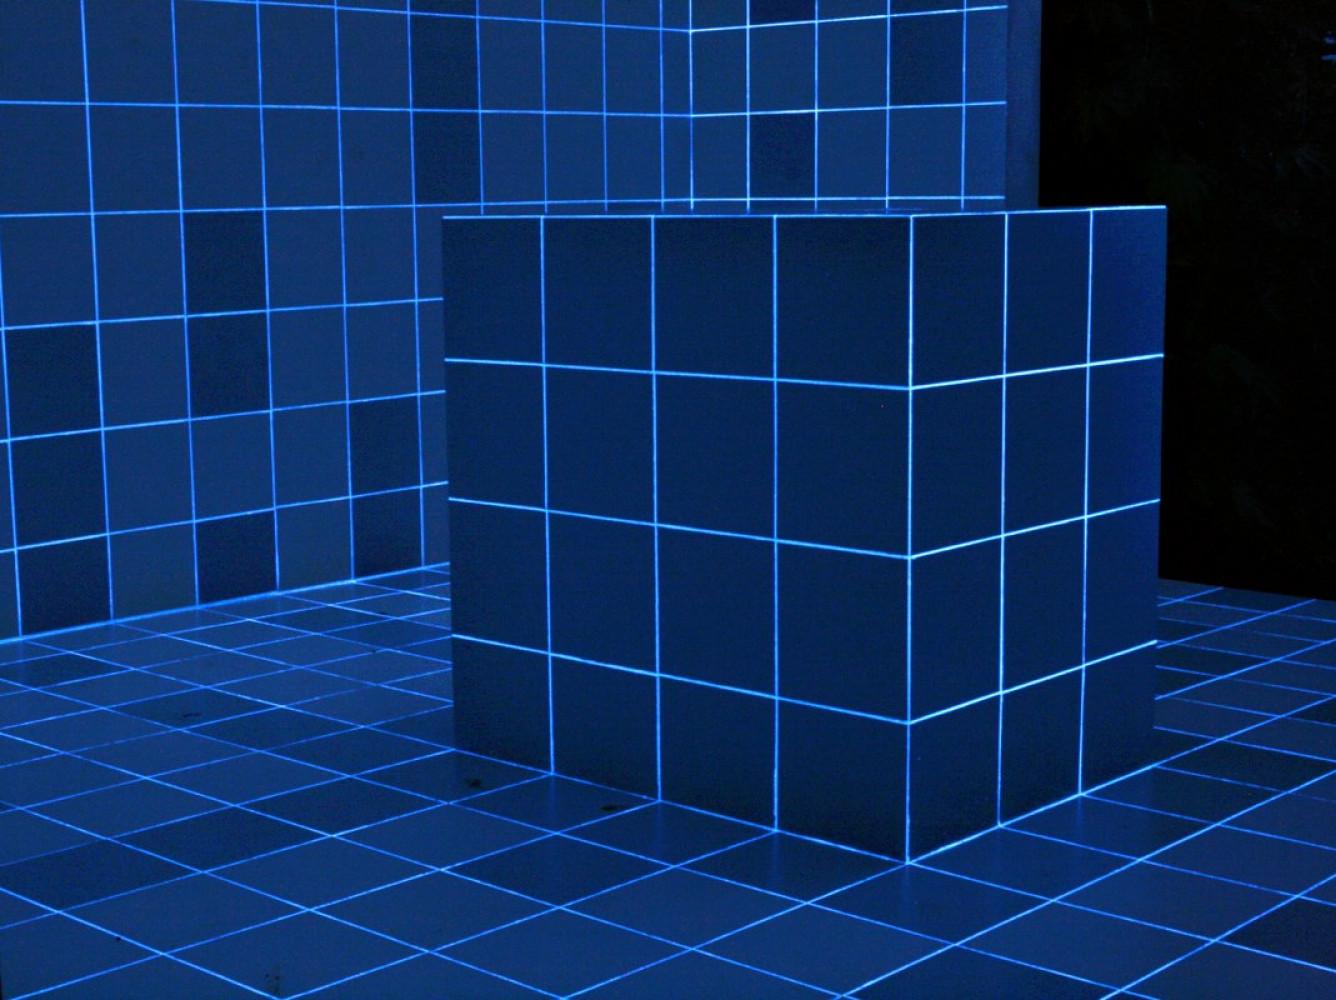 Alex Dorici, 'Azulejos Light Line 844 (night view)', 2016